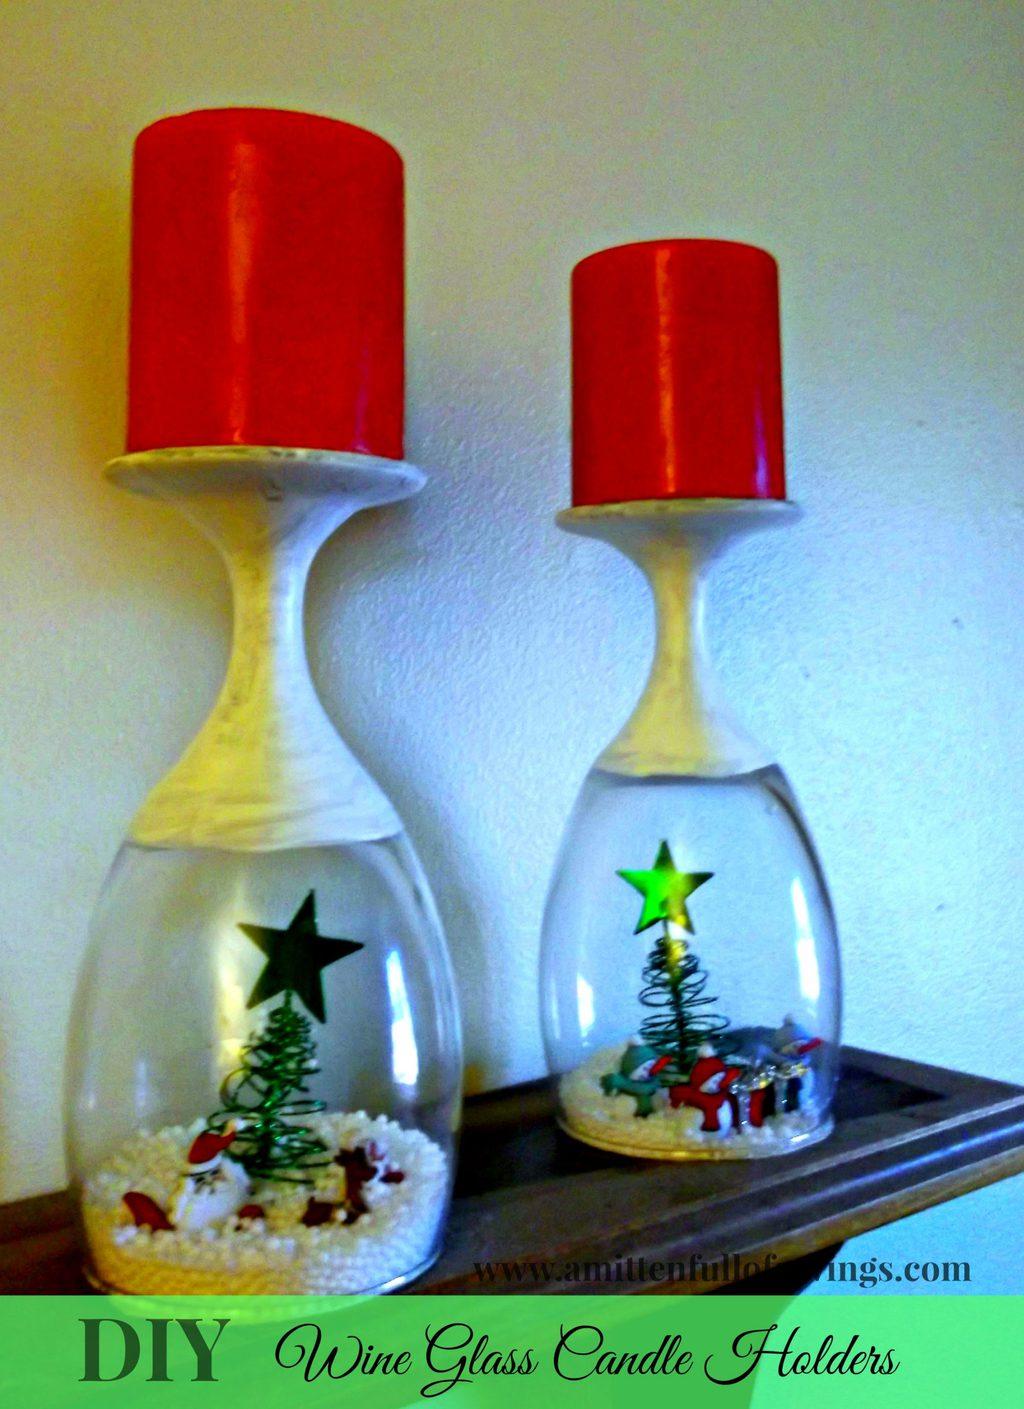 DIY Christmas Wine Glass Candle Holders